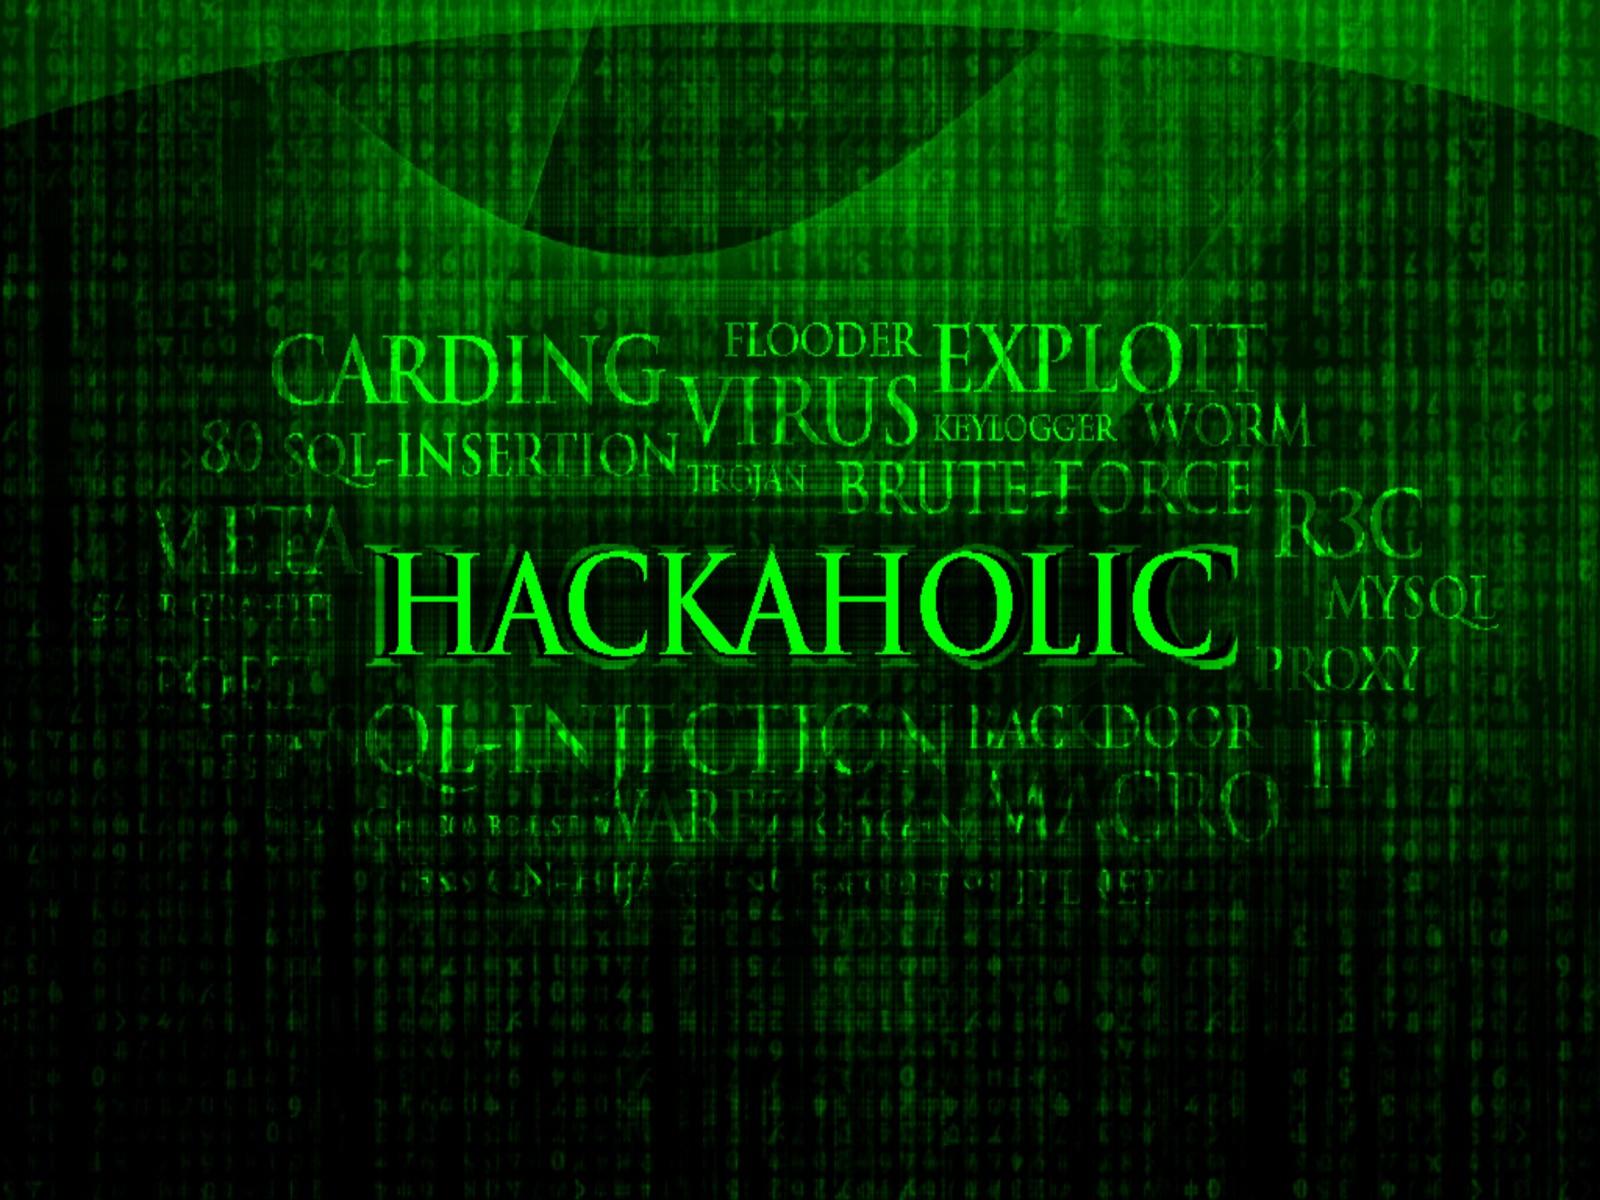 Wallpaper Hack 2310224 Hd Wallpaper Backgrounds Download